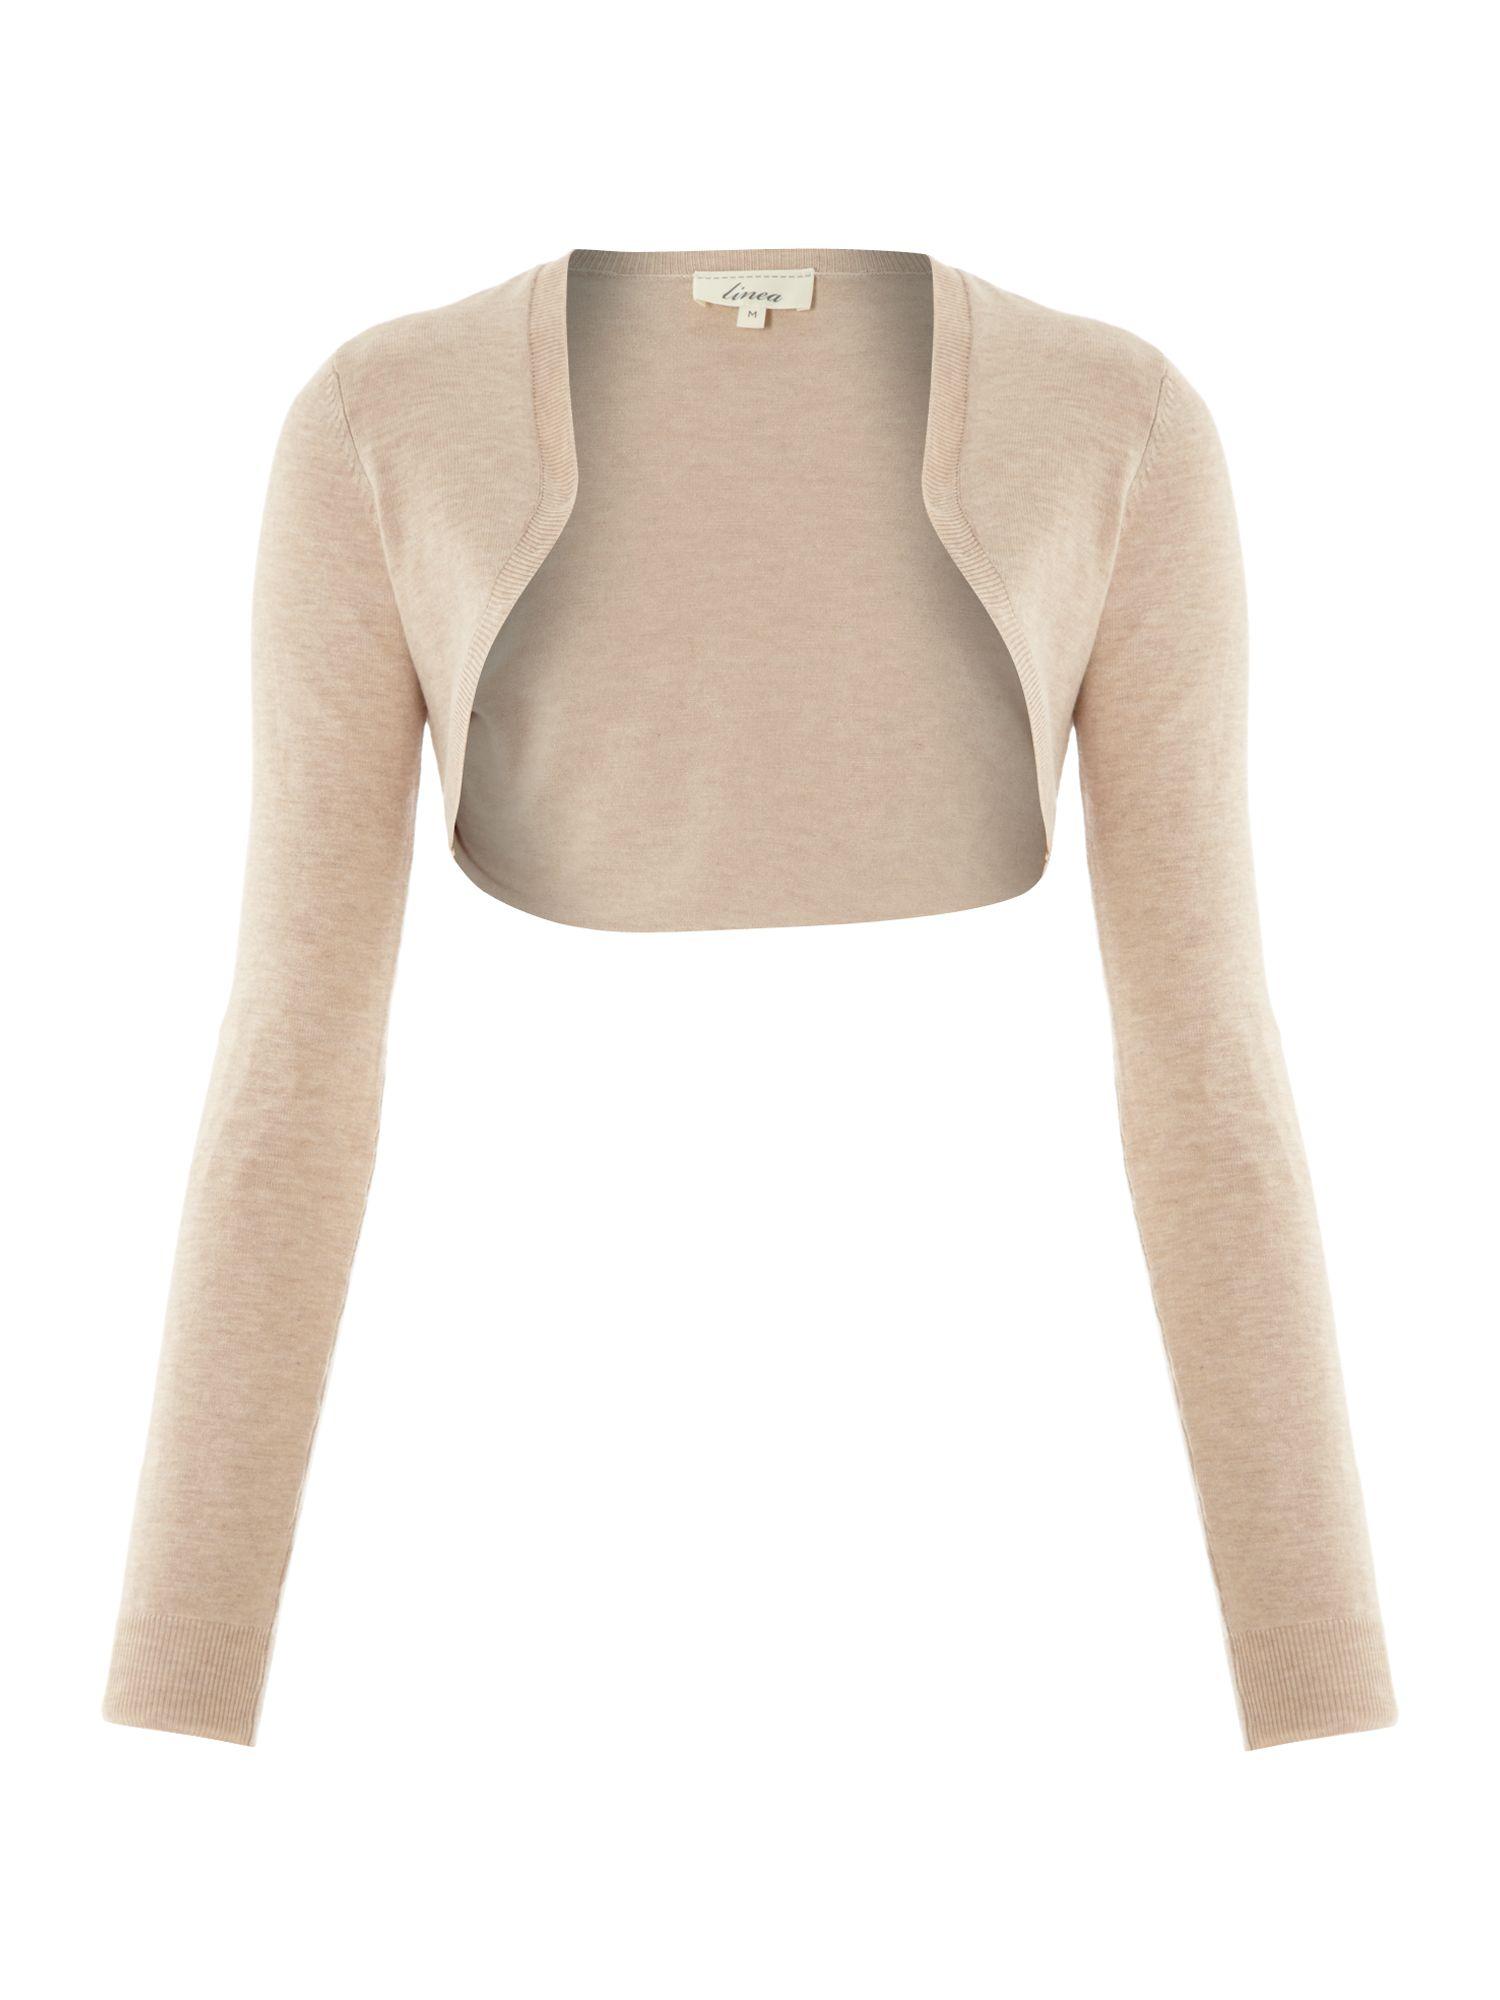 Cream Colored Shrug Sweater - Gray Cardigan Sweater